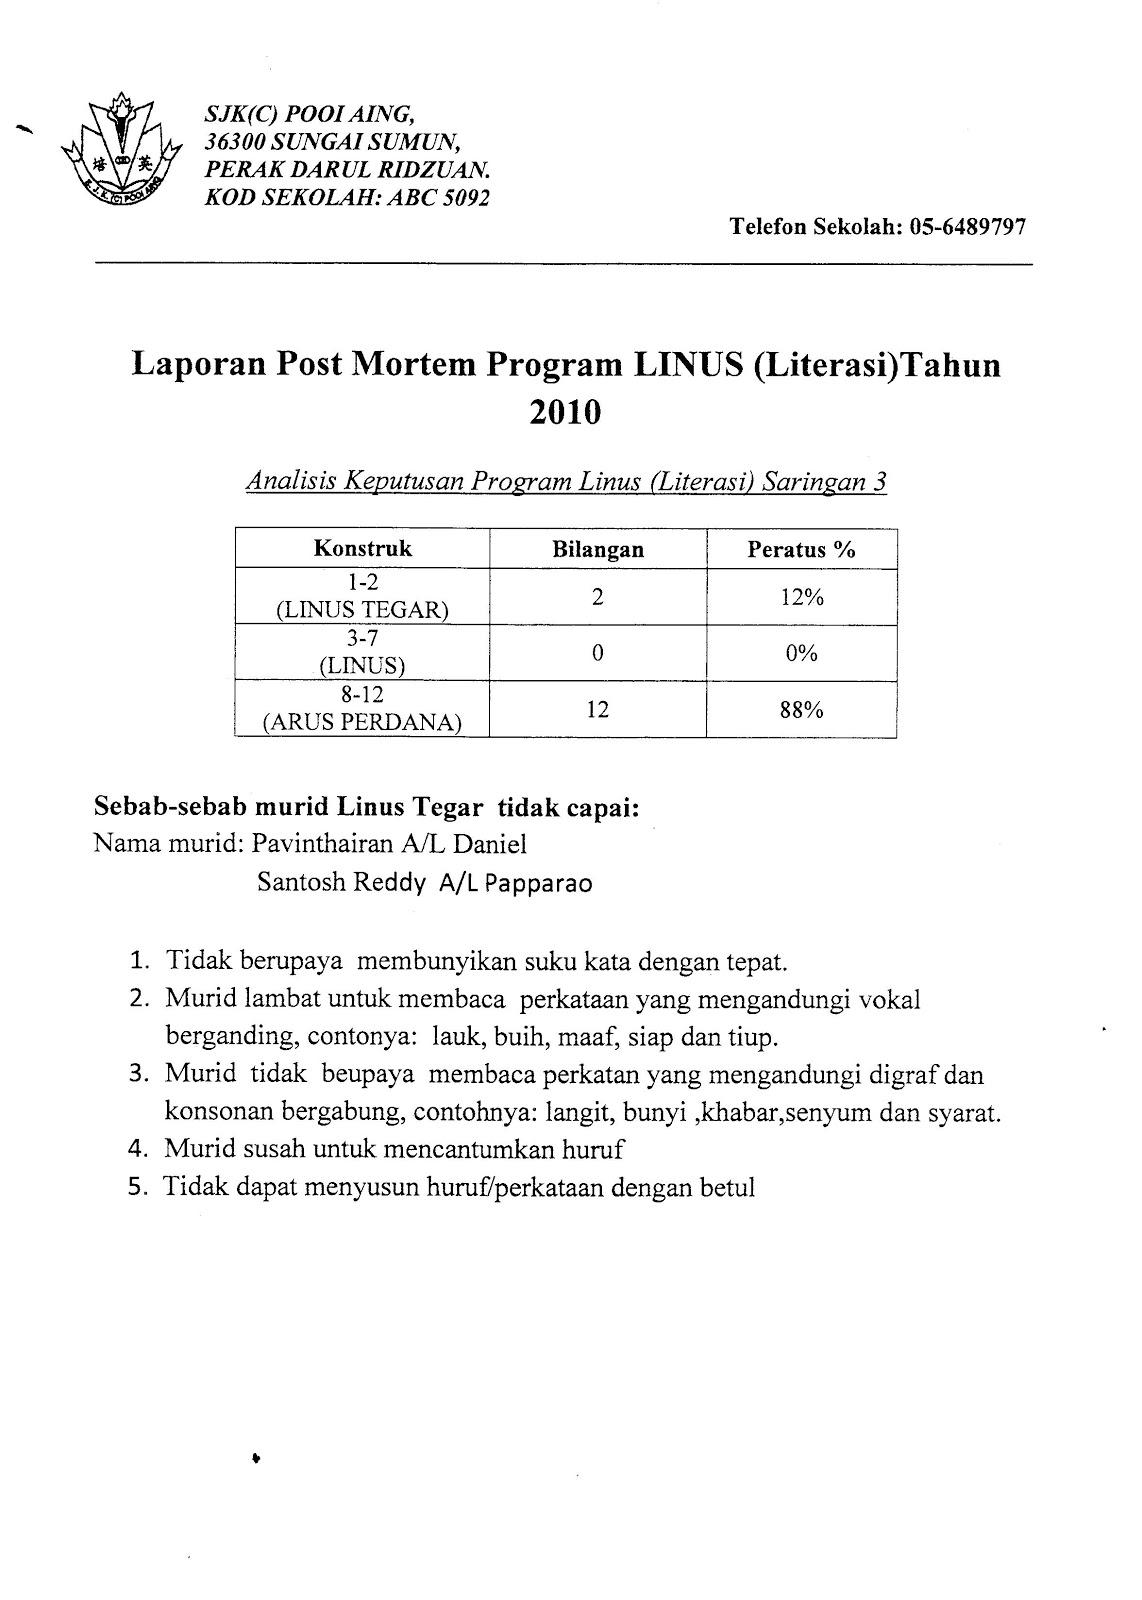 contoh format laporan Tugas Mandiri 2010[1] Format Isi: A. Latar